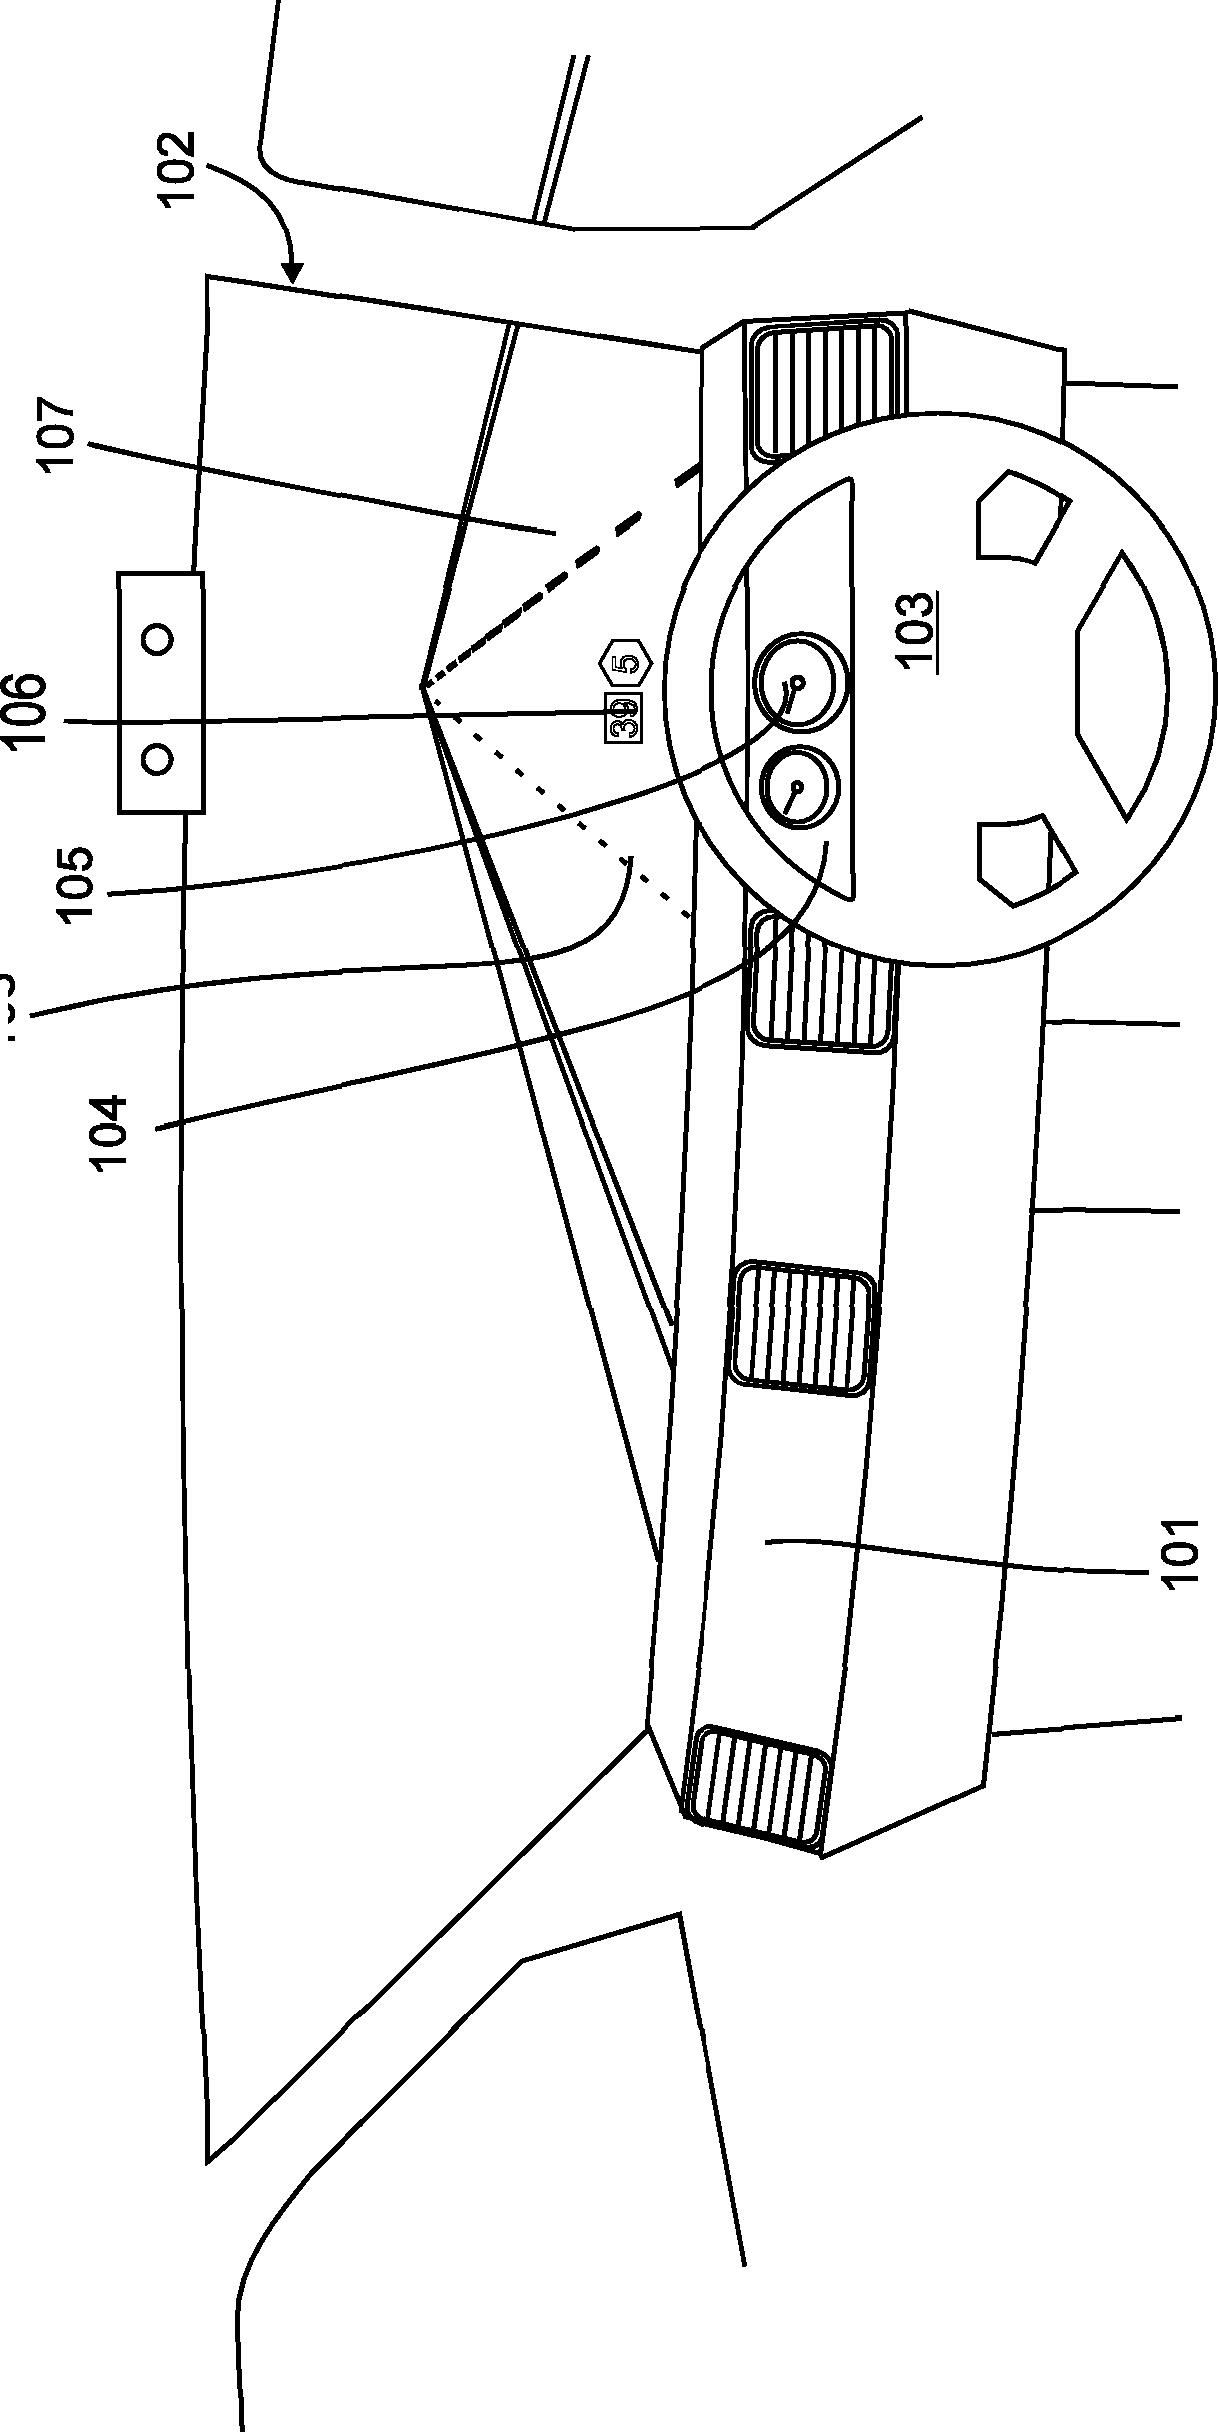 Figure GB2559606A_D0002